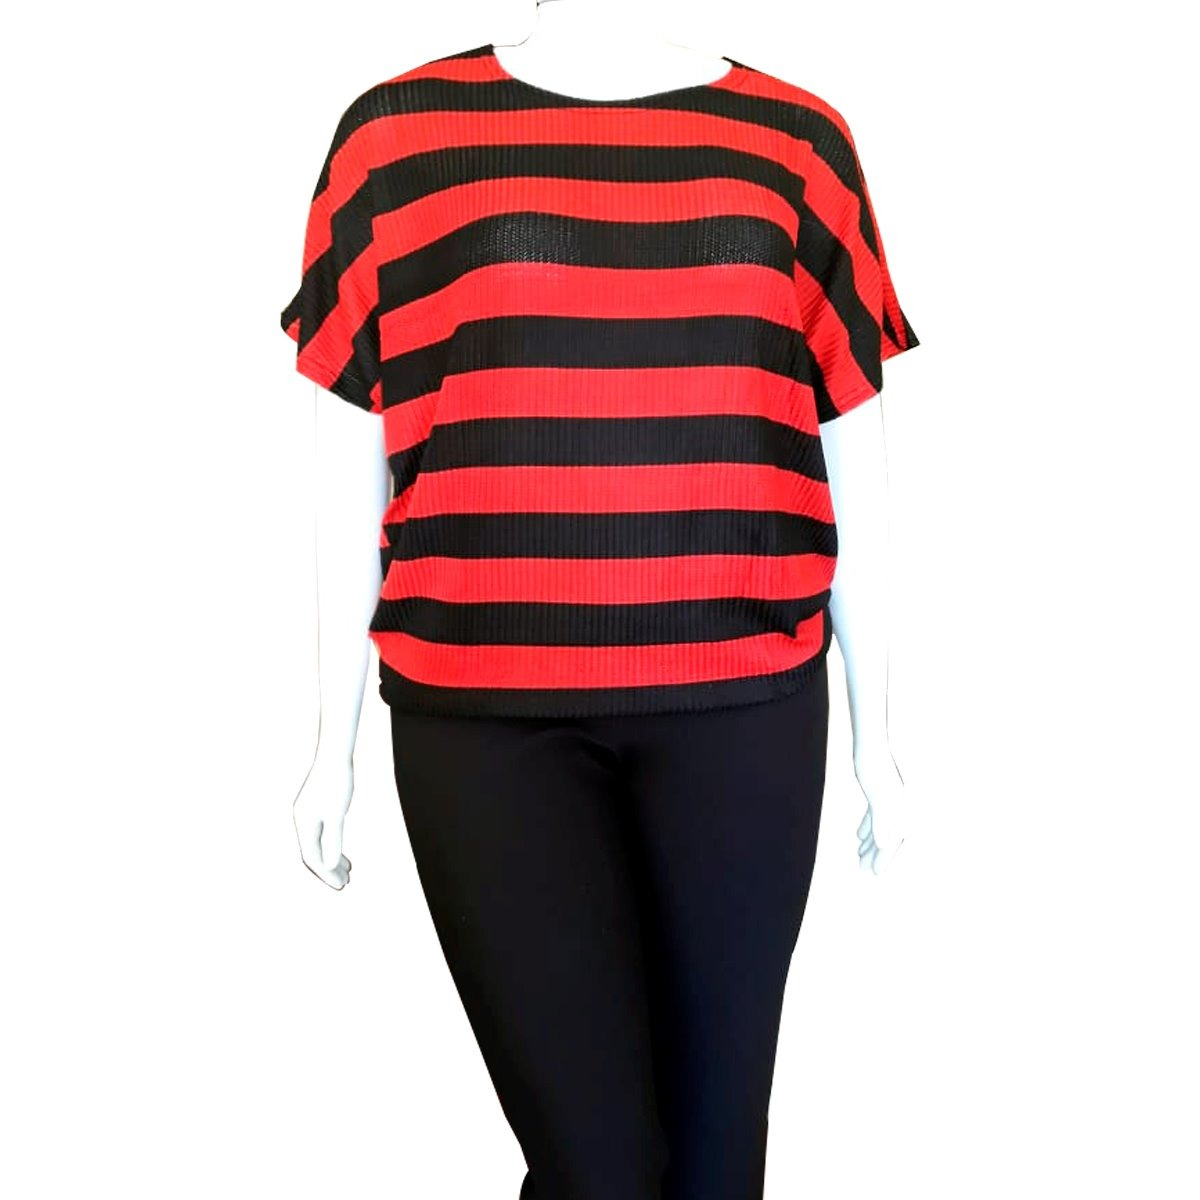 21c14ec574df22 Blusa Feminina Plus Size Tamanho Grande Malha Fria Gordinha